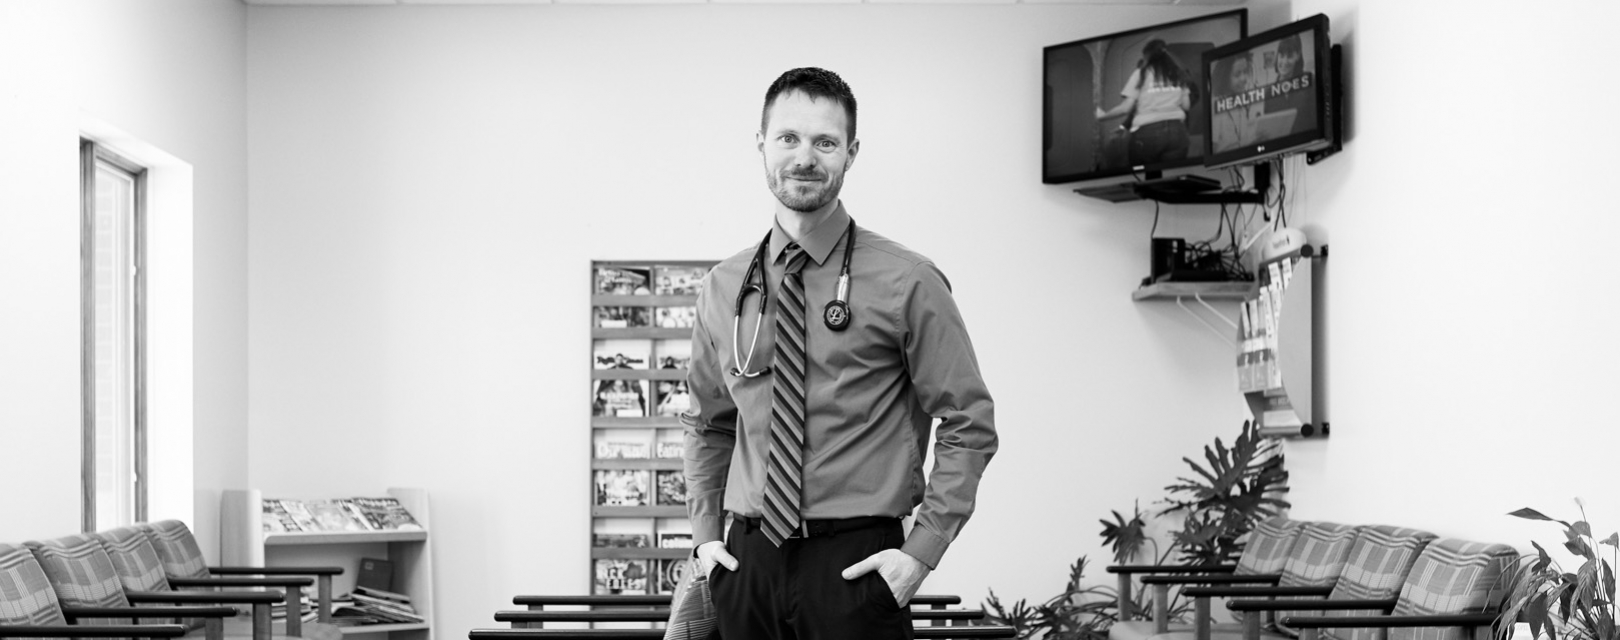 Nathan Granneman, M.D. - Jefferson City Medical Group